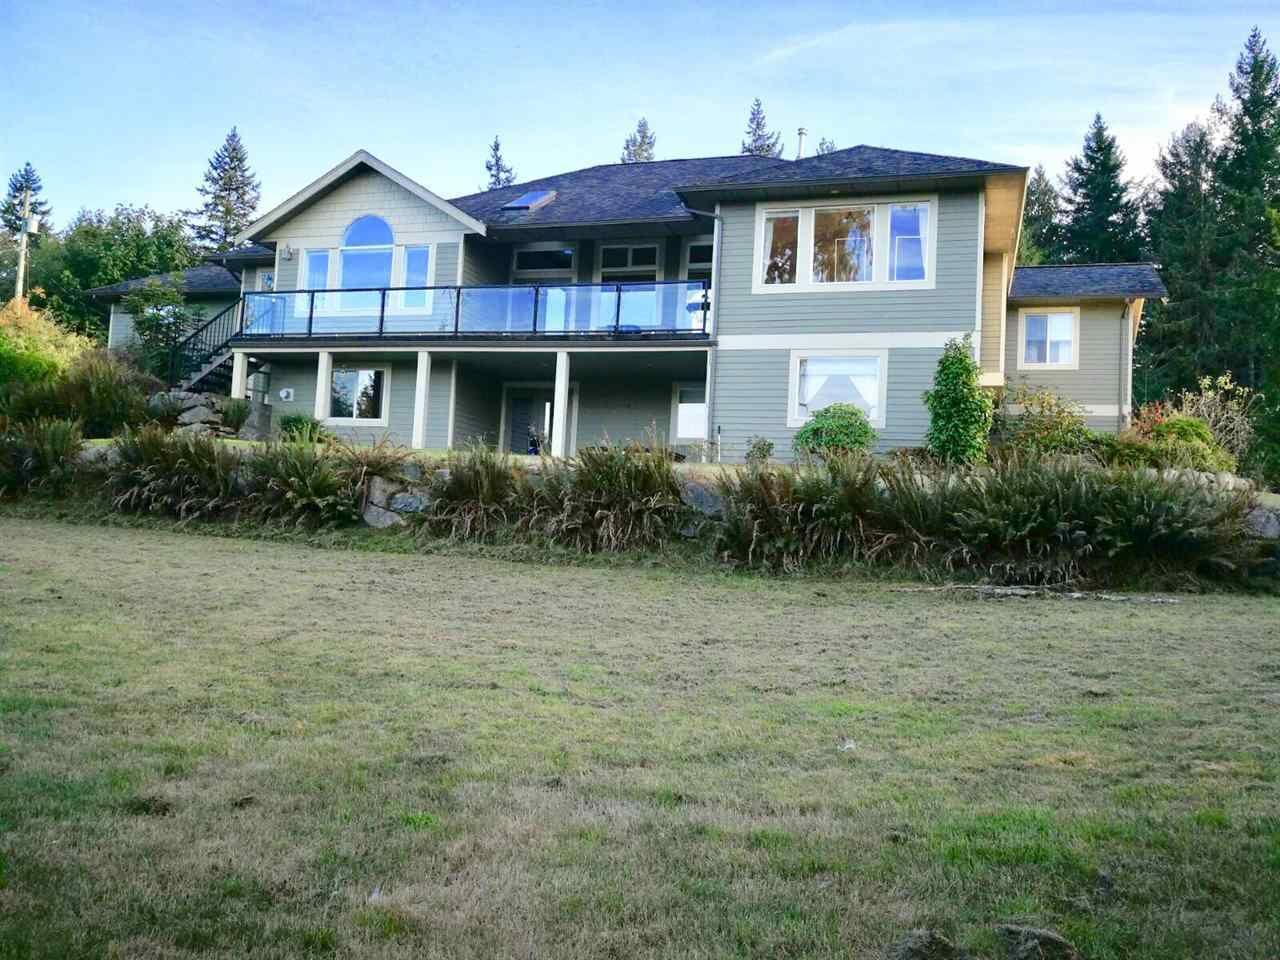 Main Photo: 4736 BEAR BAY Road in Pender Harbour: Pender Harbour Egmont House for sale (Sunshine Coast)  : MLS®# R2529232